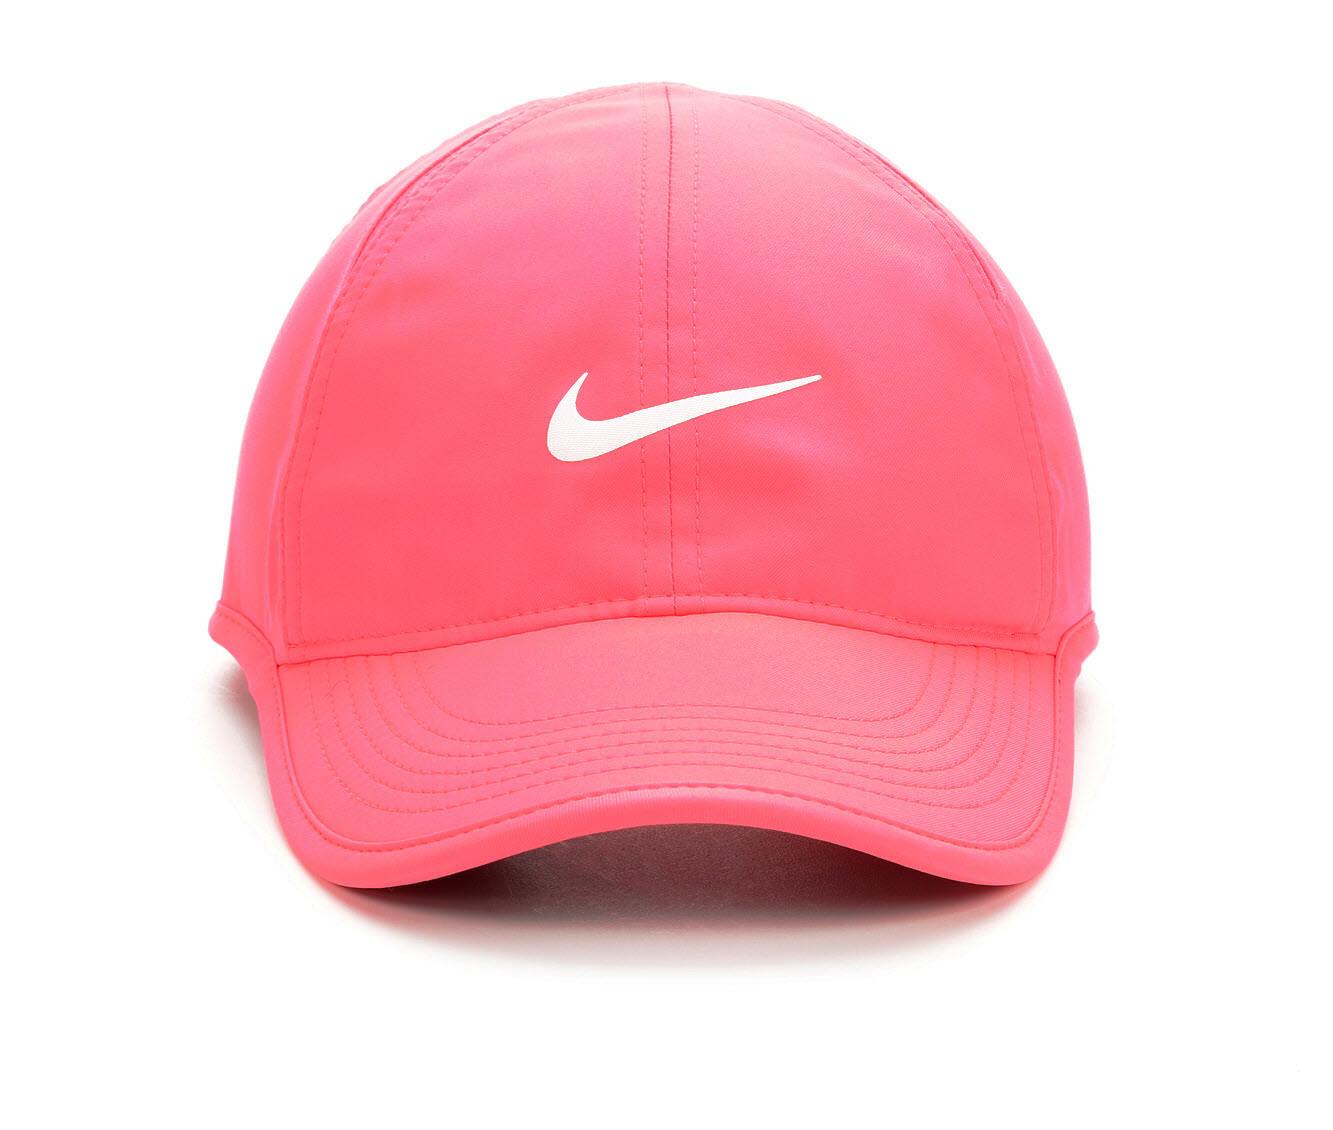 01be8a29 ... hat nike baseballcap c2af4 5ef51; low cost nike featherlight adjustable  cap 9484d 16c58